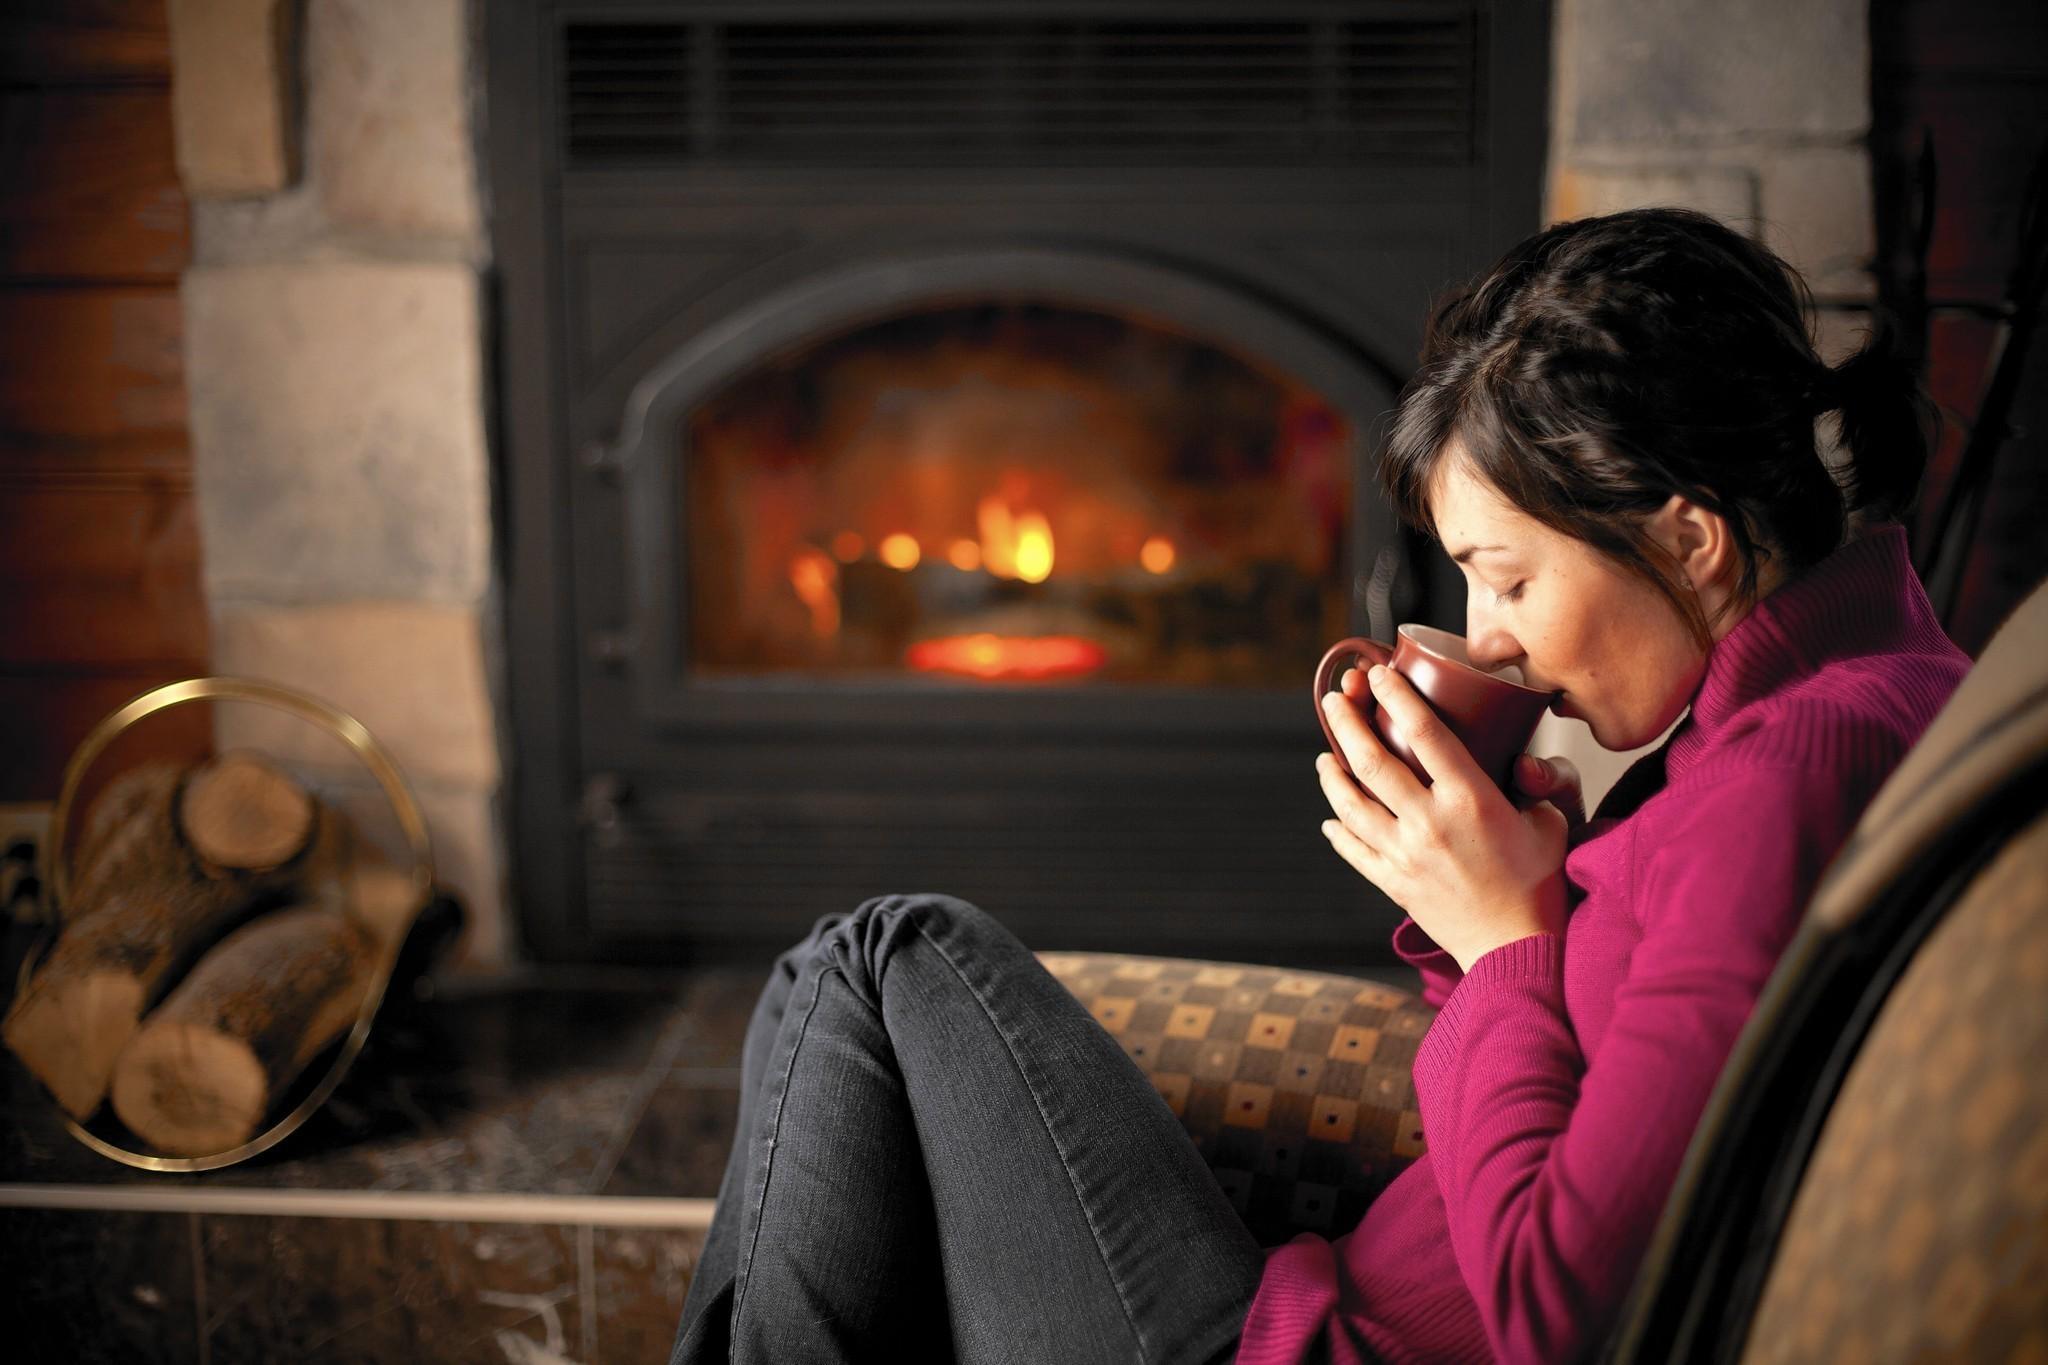 common heating myths that can raise energy bills chicago tribune